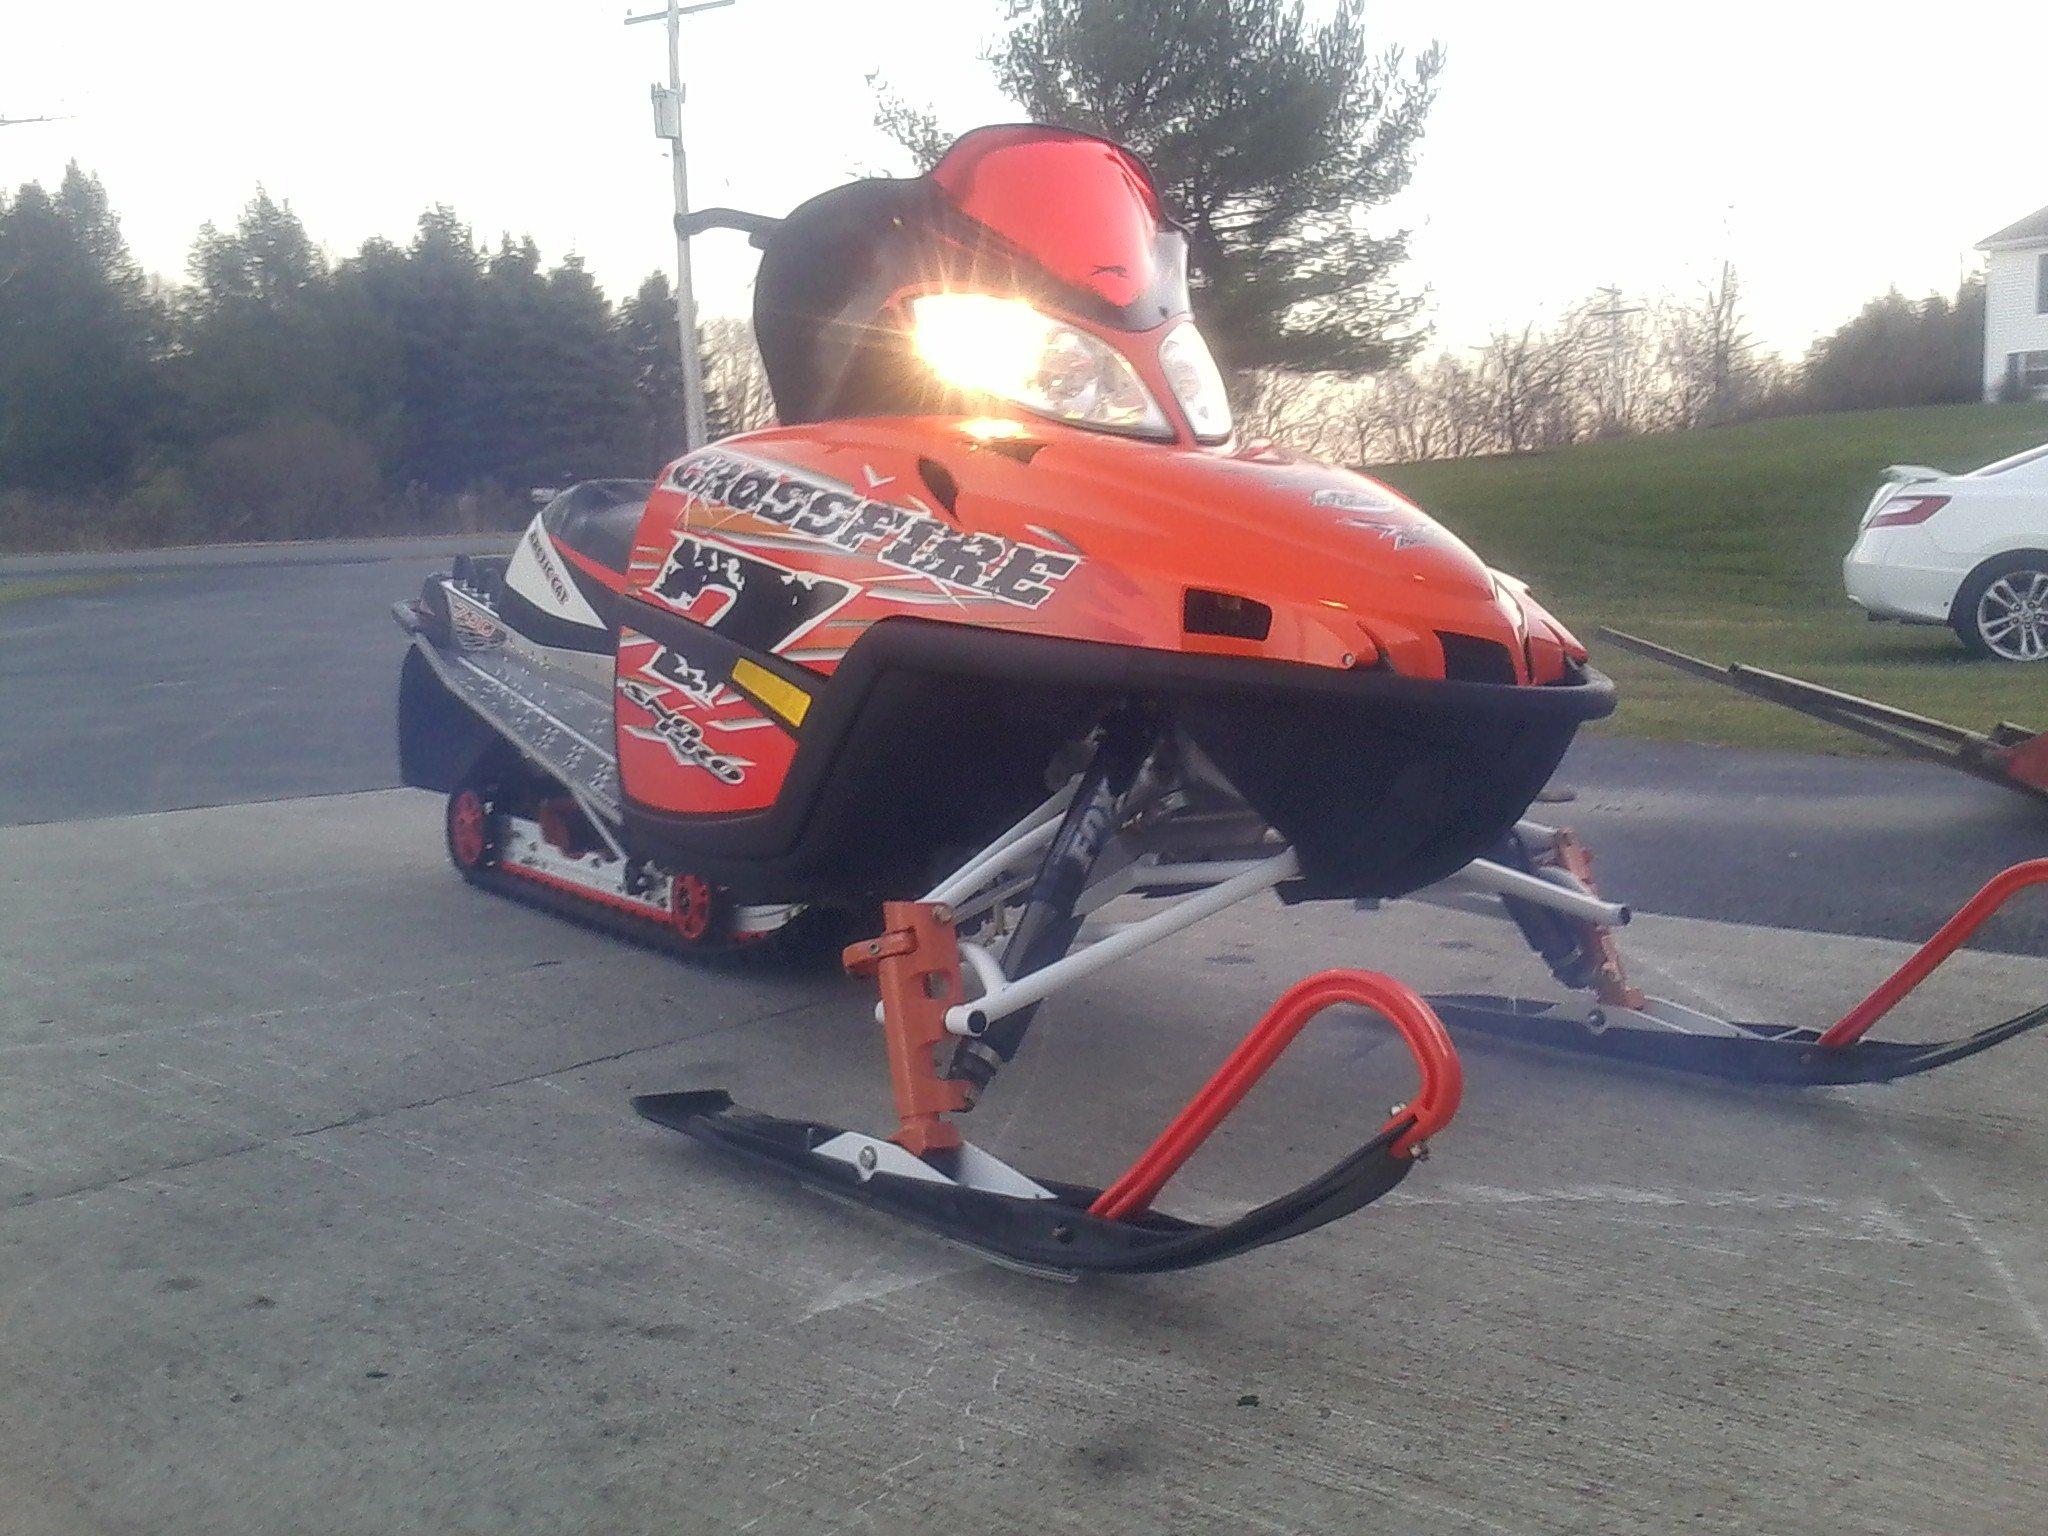 2006 Crossfire 700 Sno Pro-sled.jpg